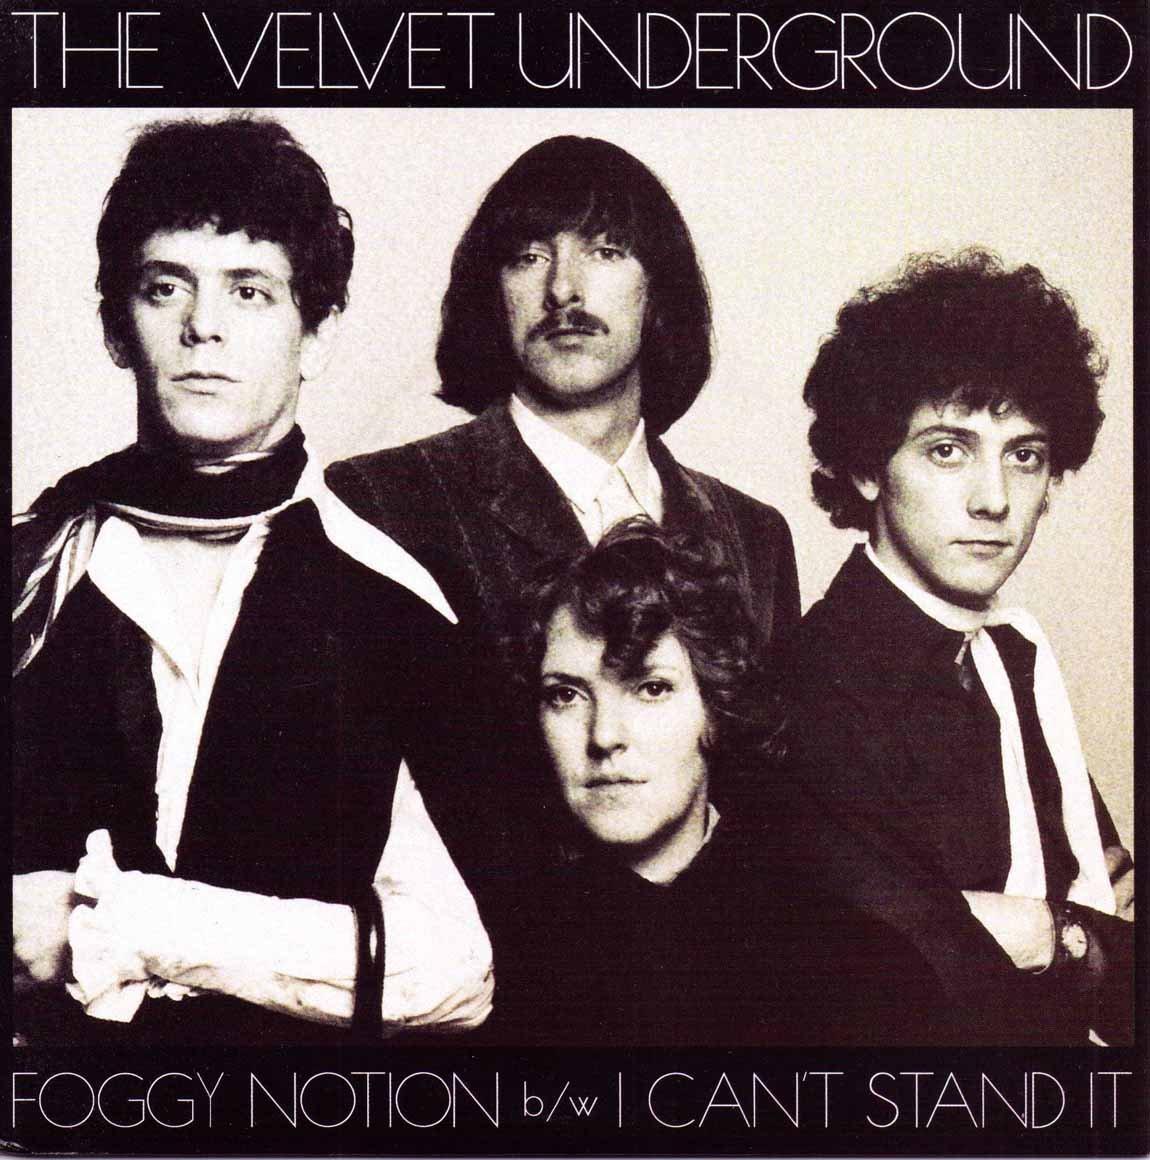 the velvet underground foggy notion free mp3